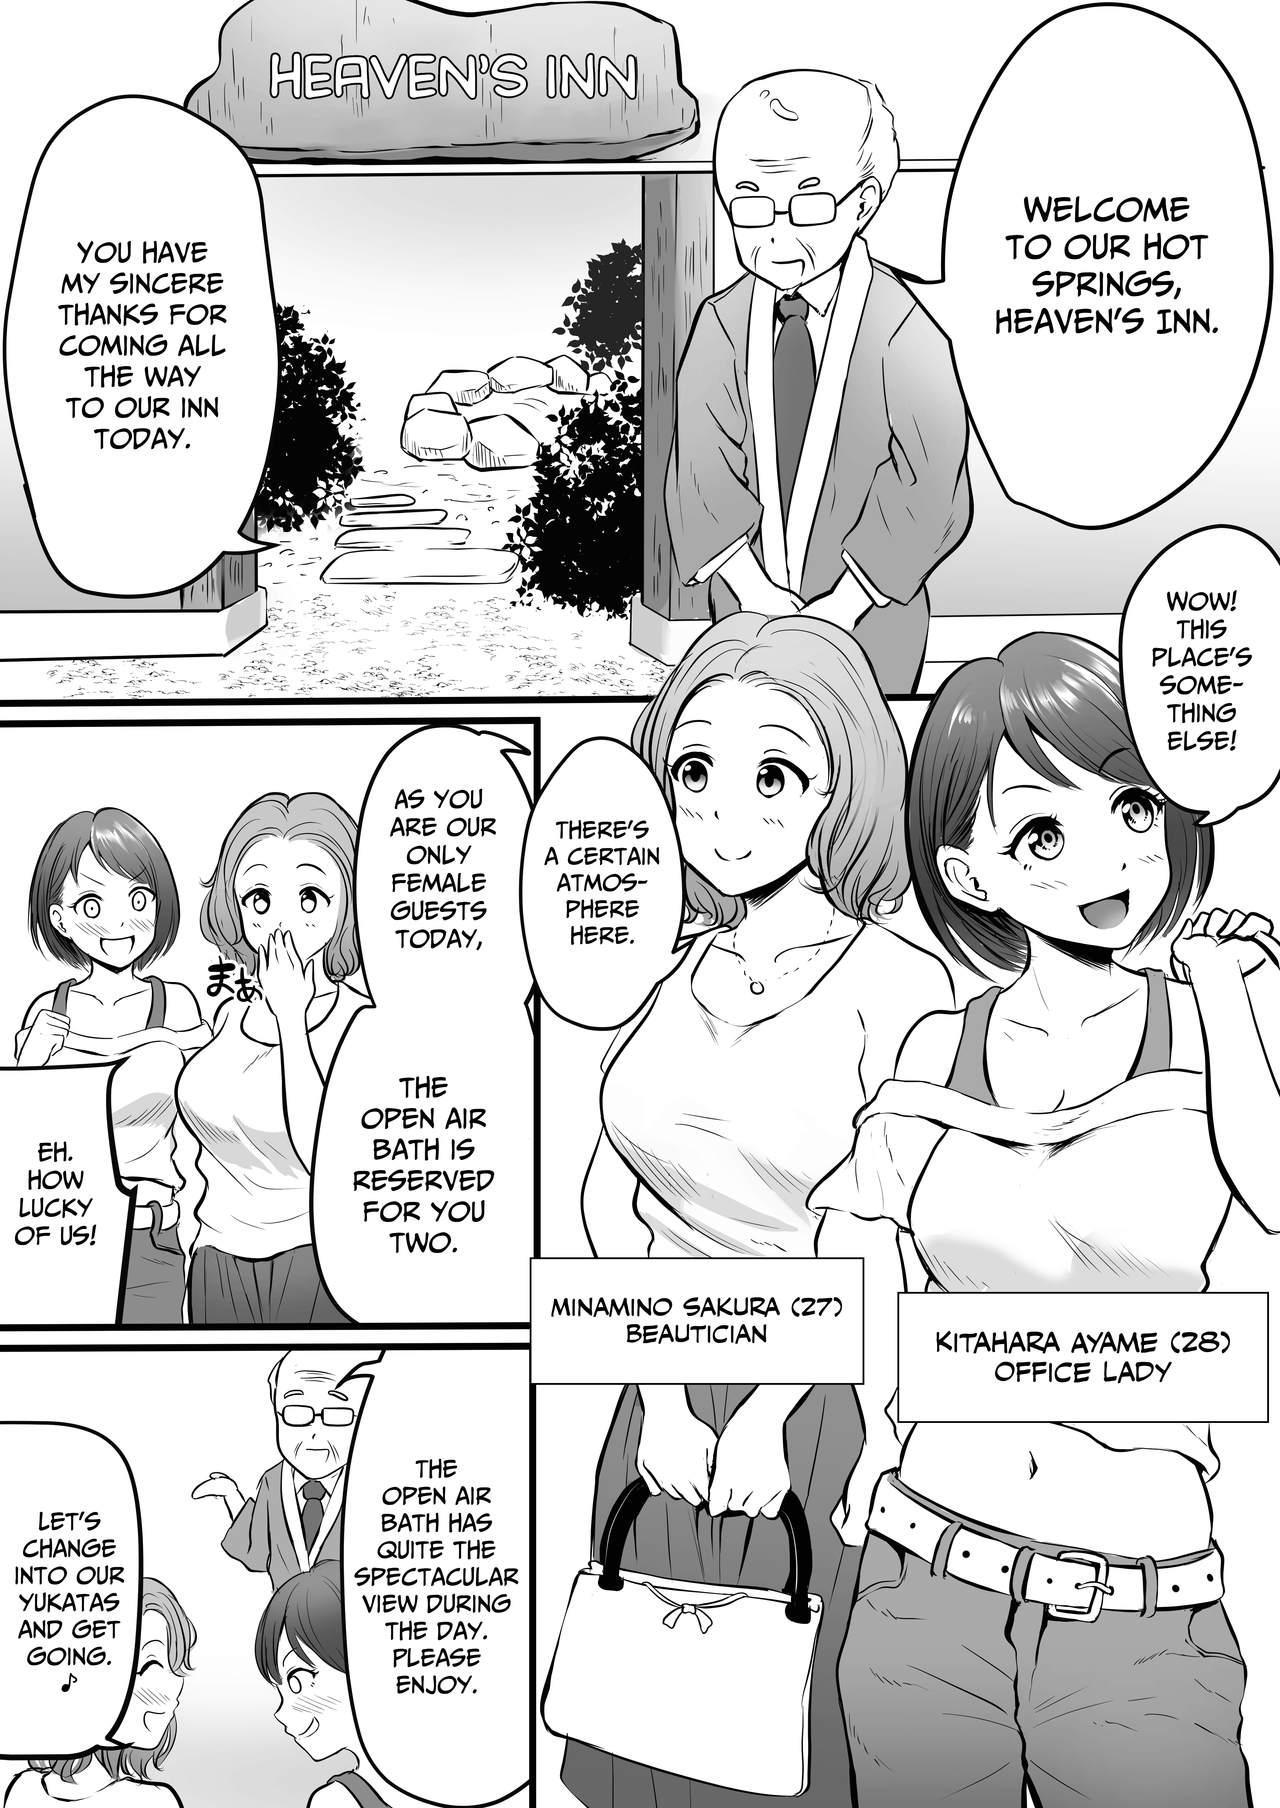 Onsen Ryokan de Zurineta Shuushuu Mission! | The Hot Springs Inn Fap Material Gathering Mission! 1